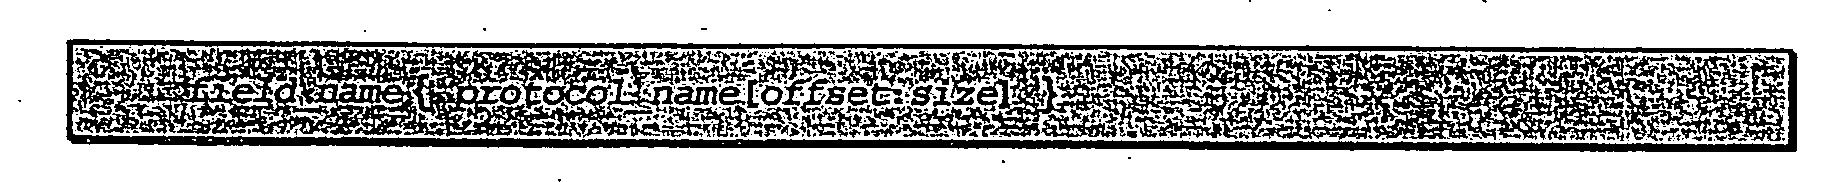 Figure US20040148382A1-20040729-P00005